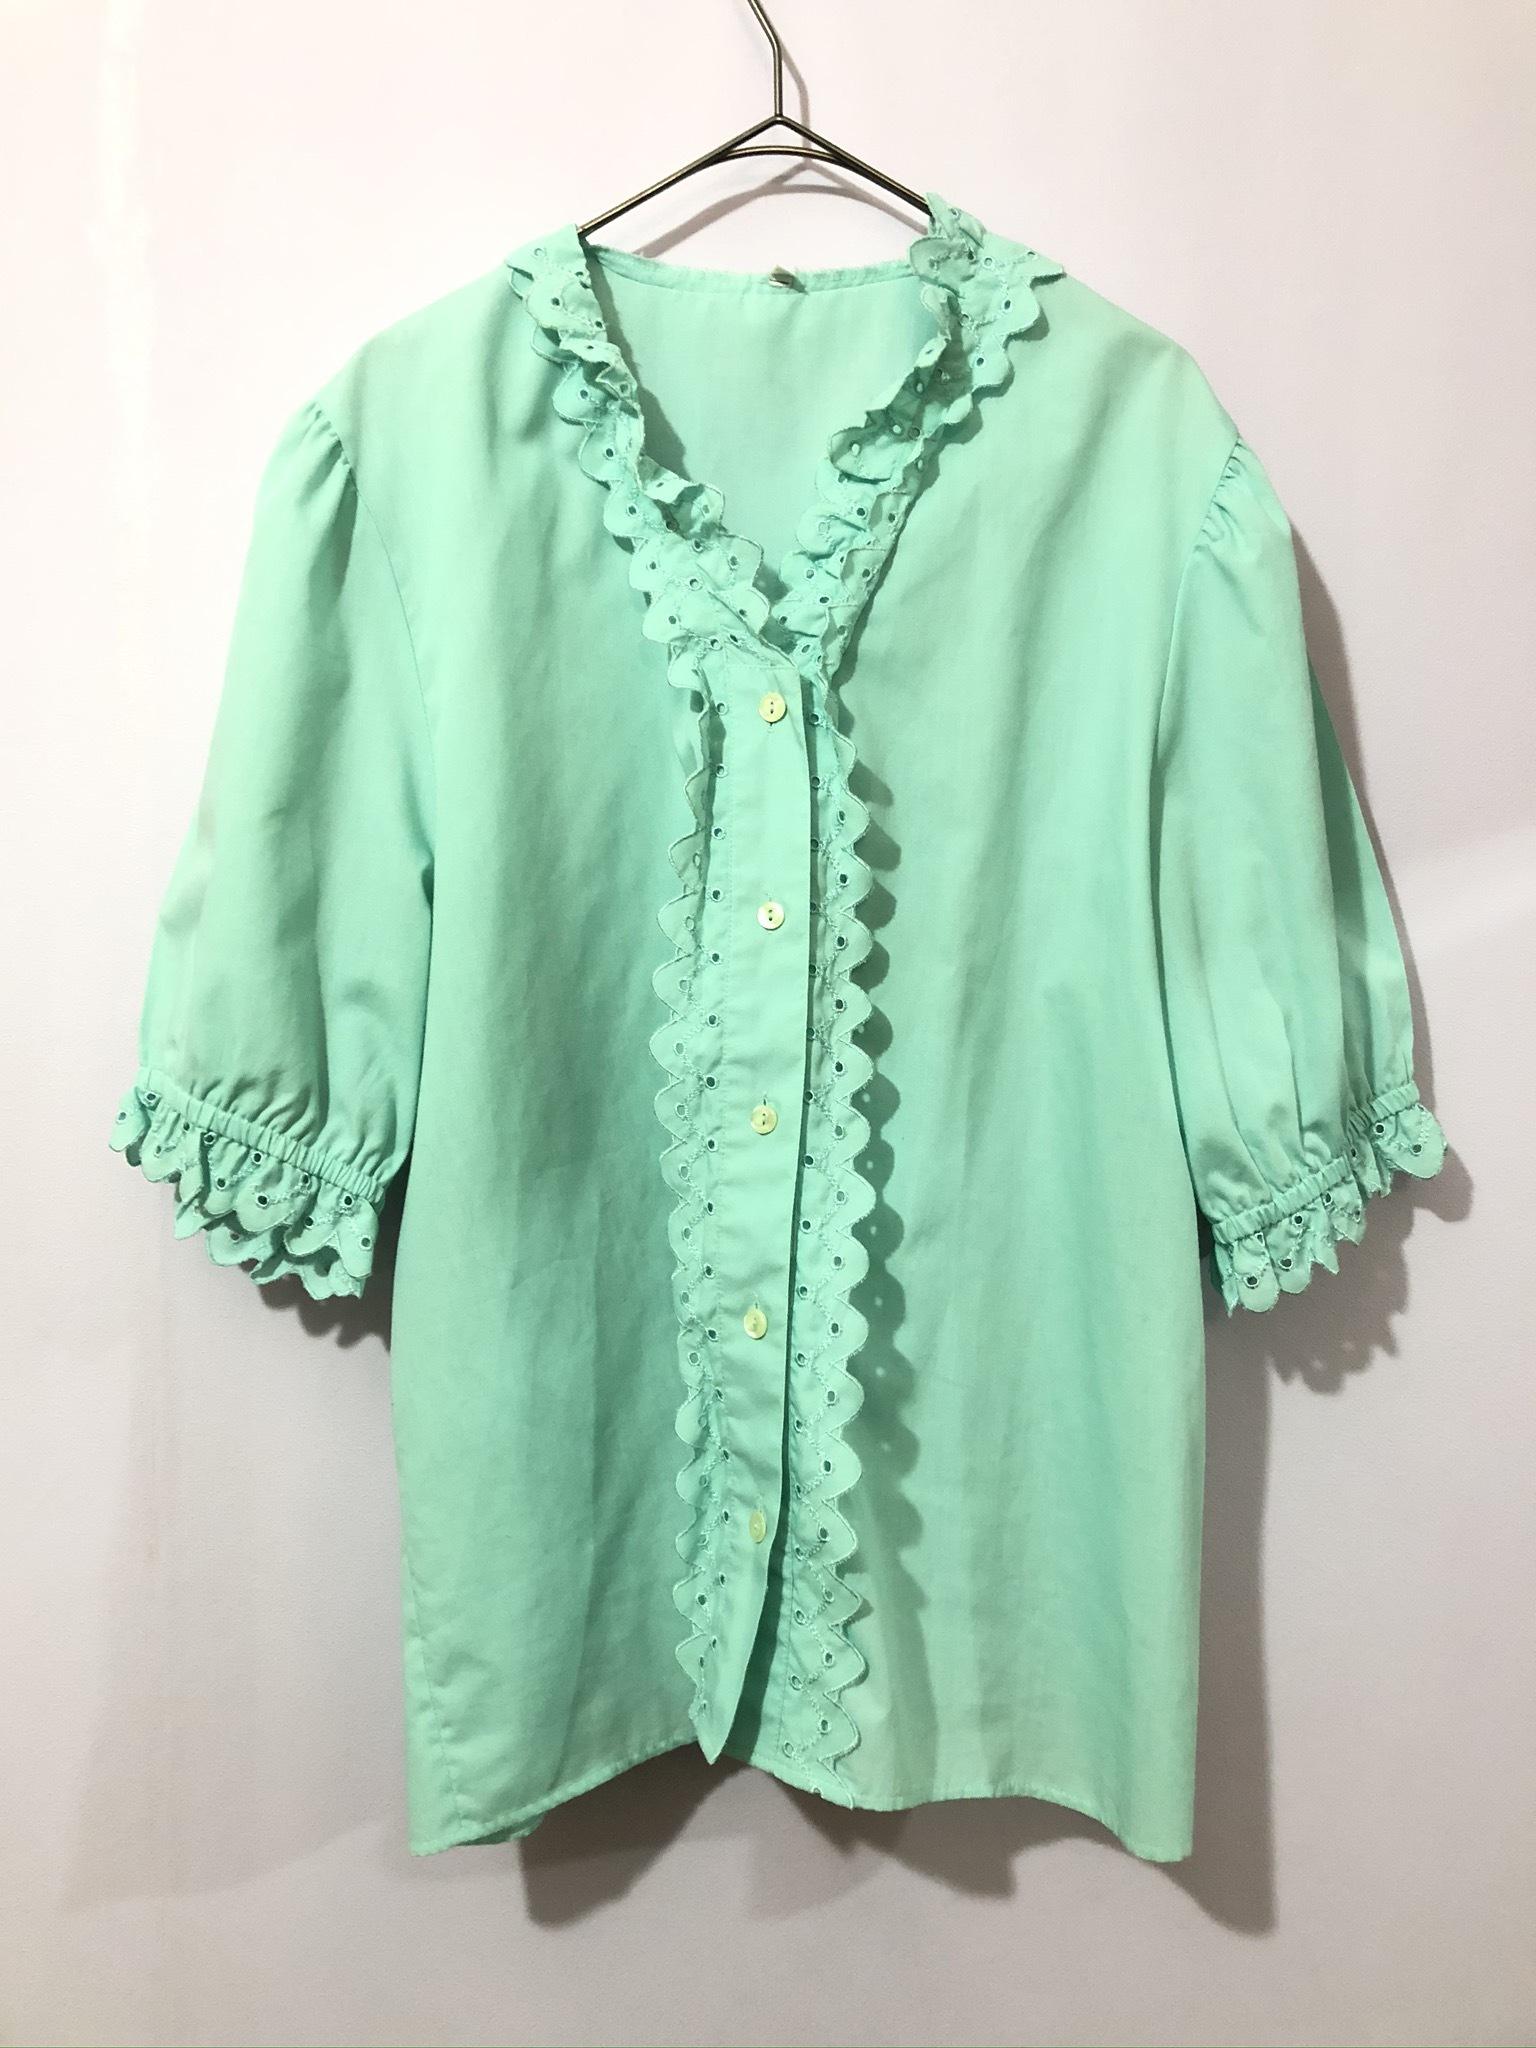 cotton frill blouse mint green